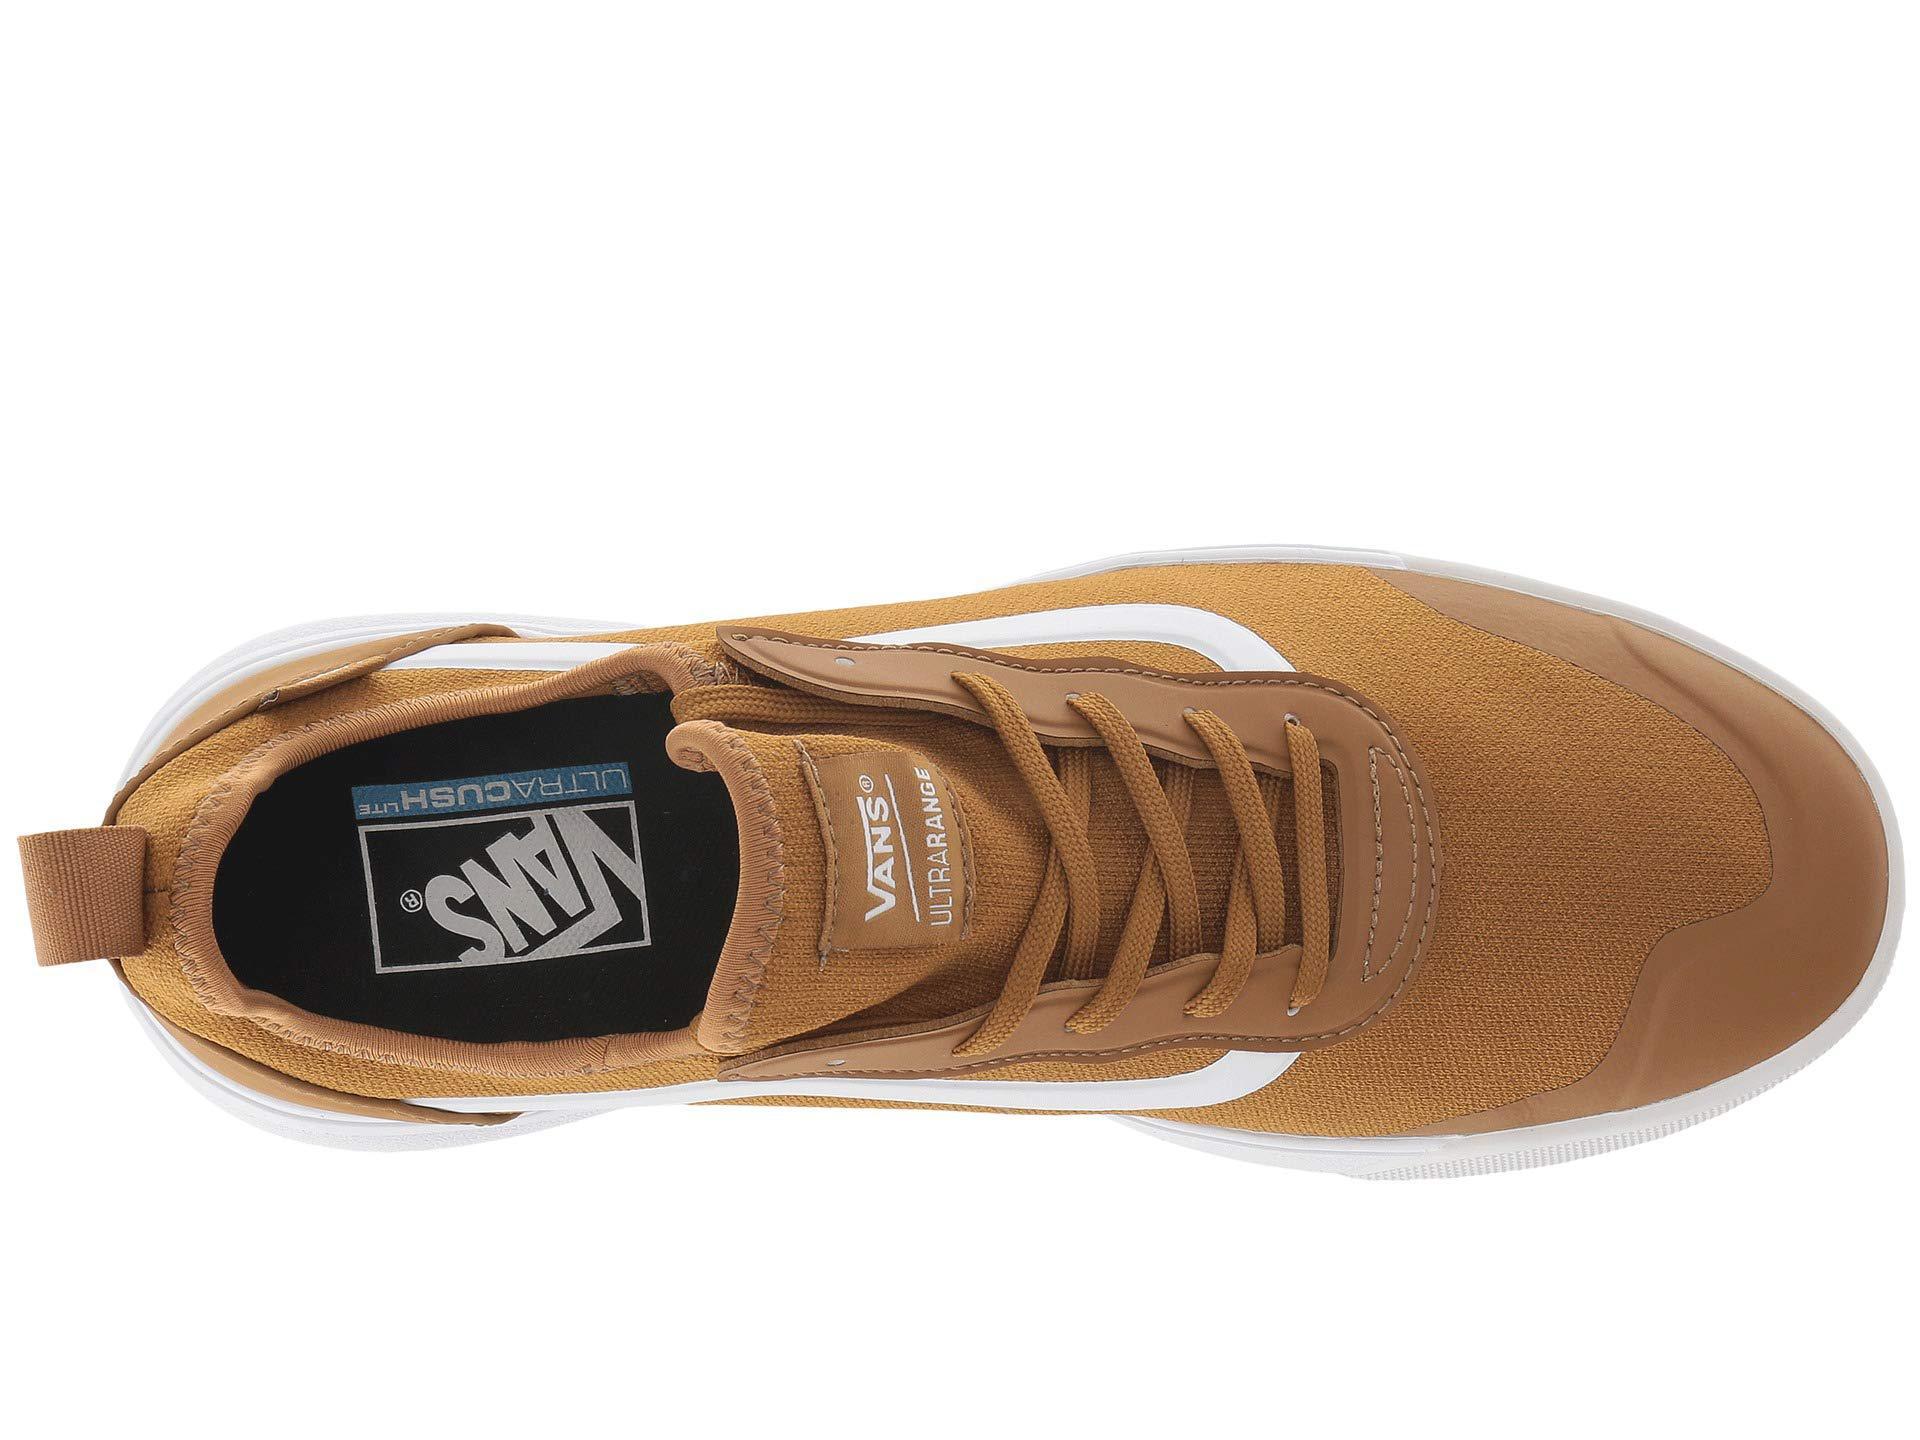 4c7d075af3163e Vans - Multicolor Ultrarange Ac (catawba Grape black) Skate Shoes for Men  -. View fullscreen